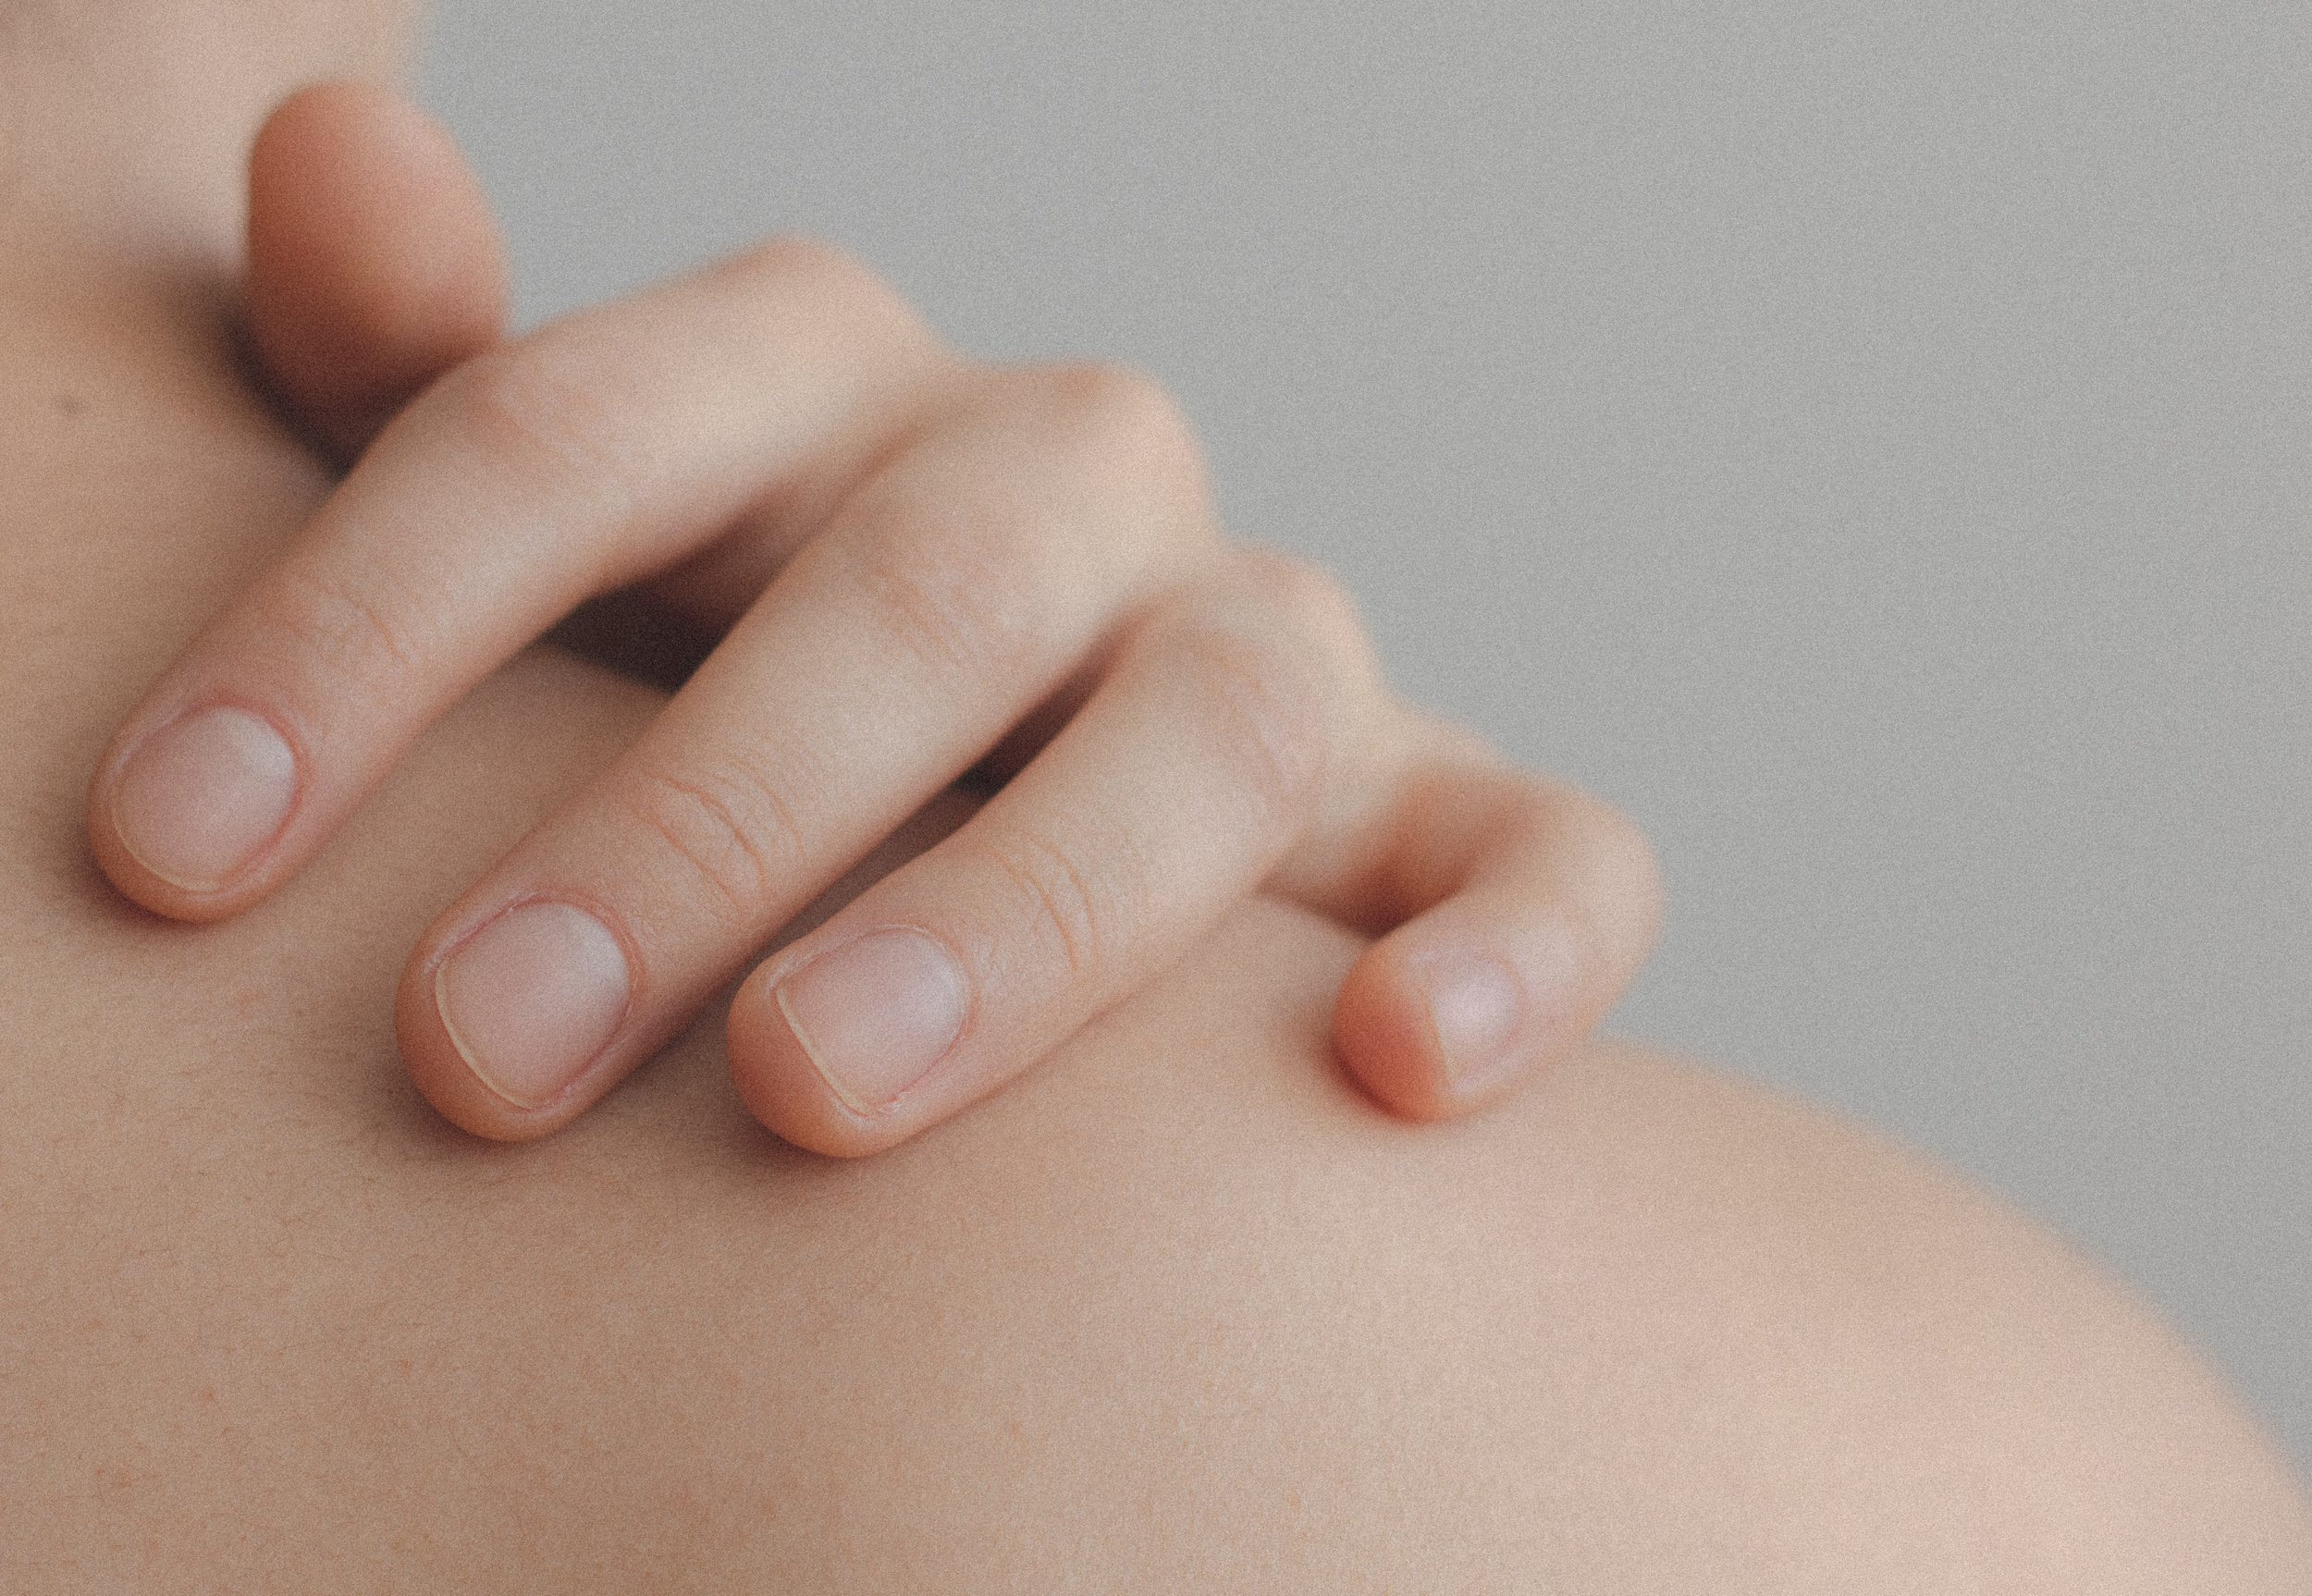 close-up-hand-nude-1727200.jpg